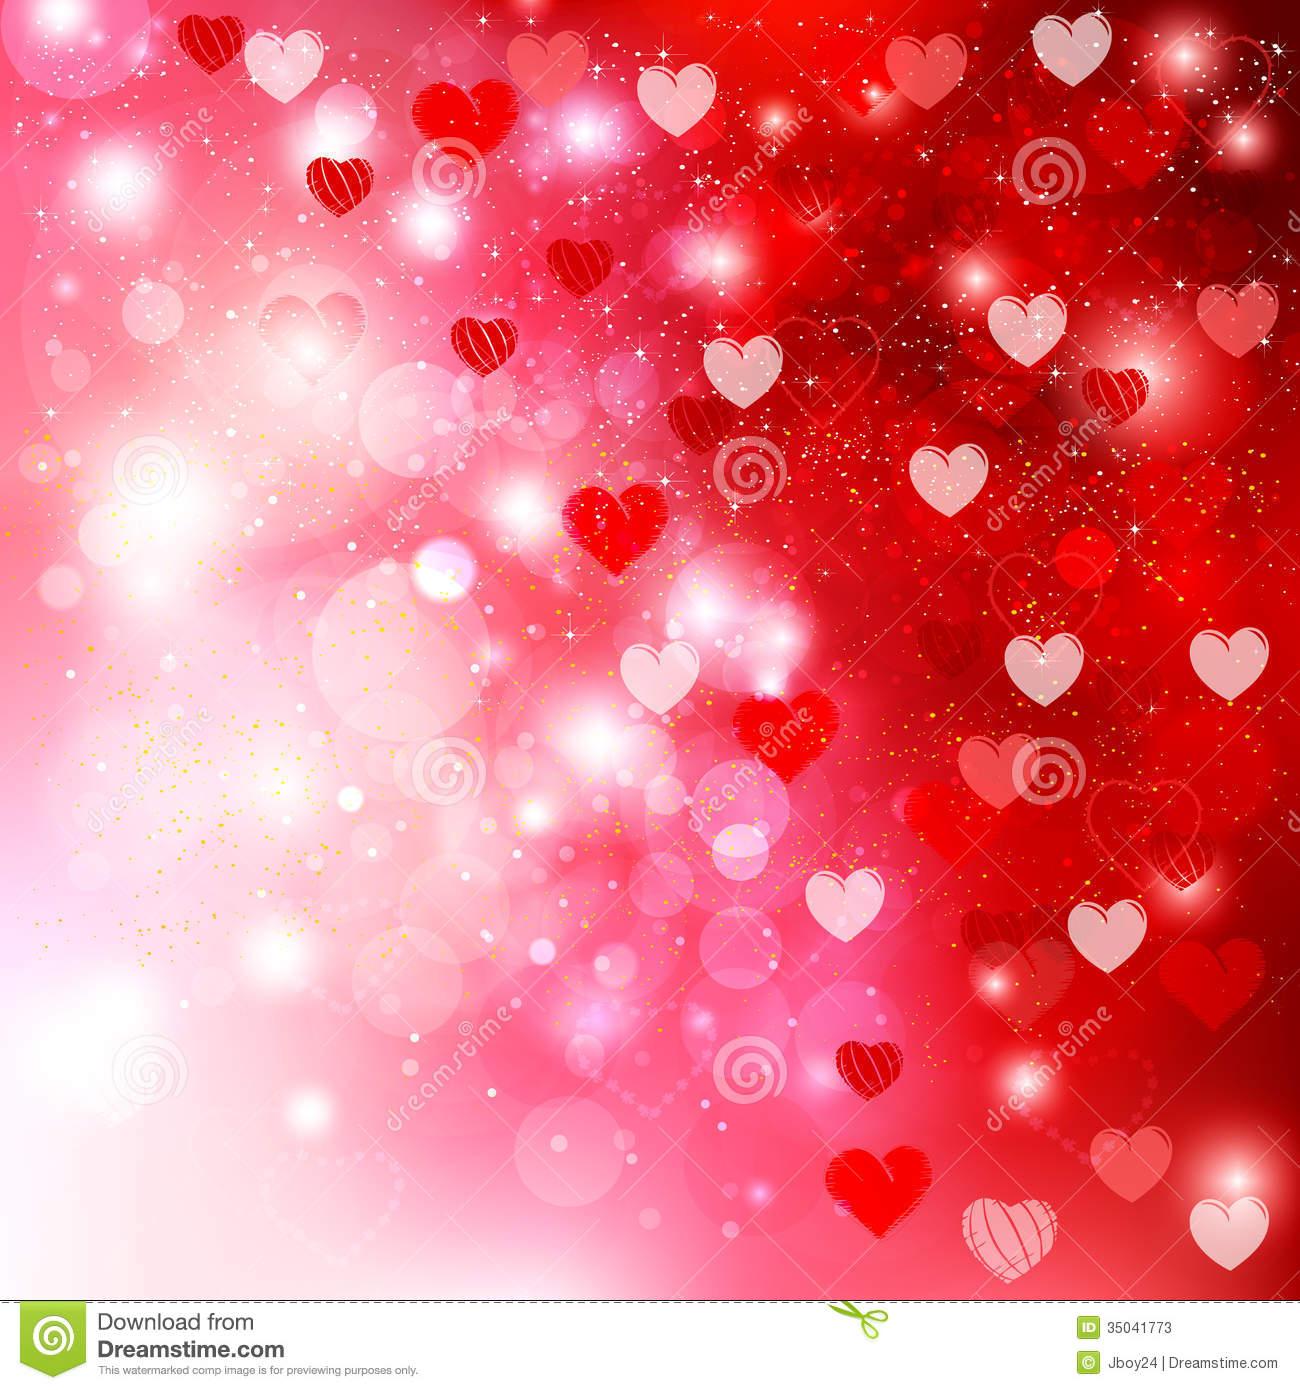 pretty heart designs wallpapers - photo #37